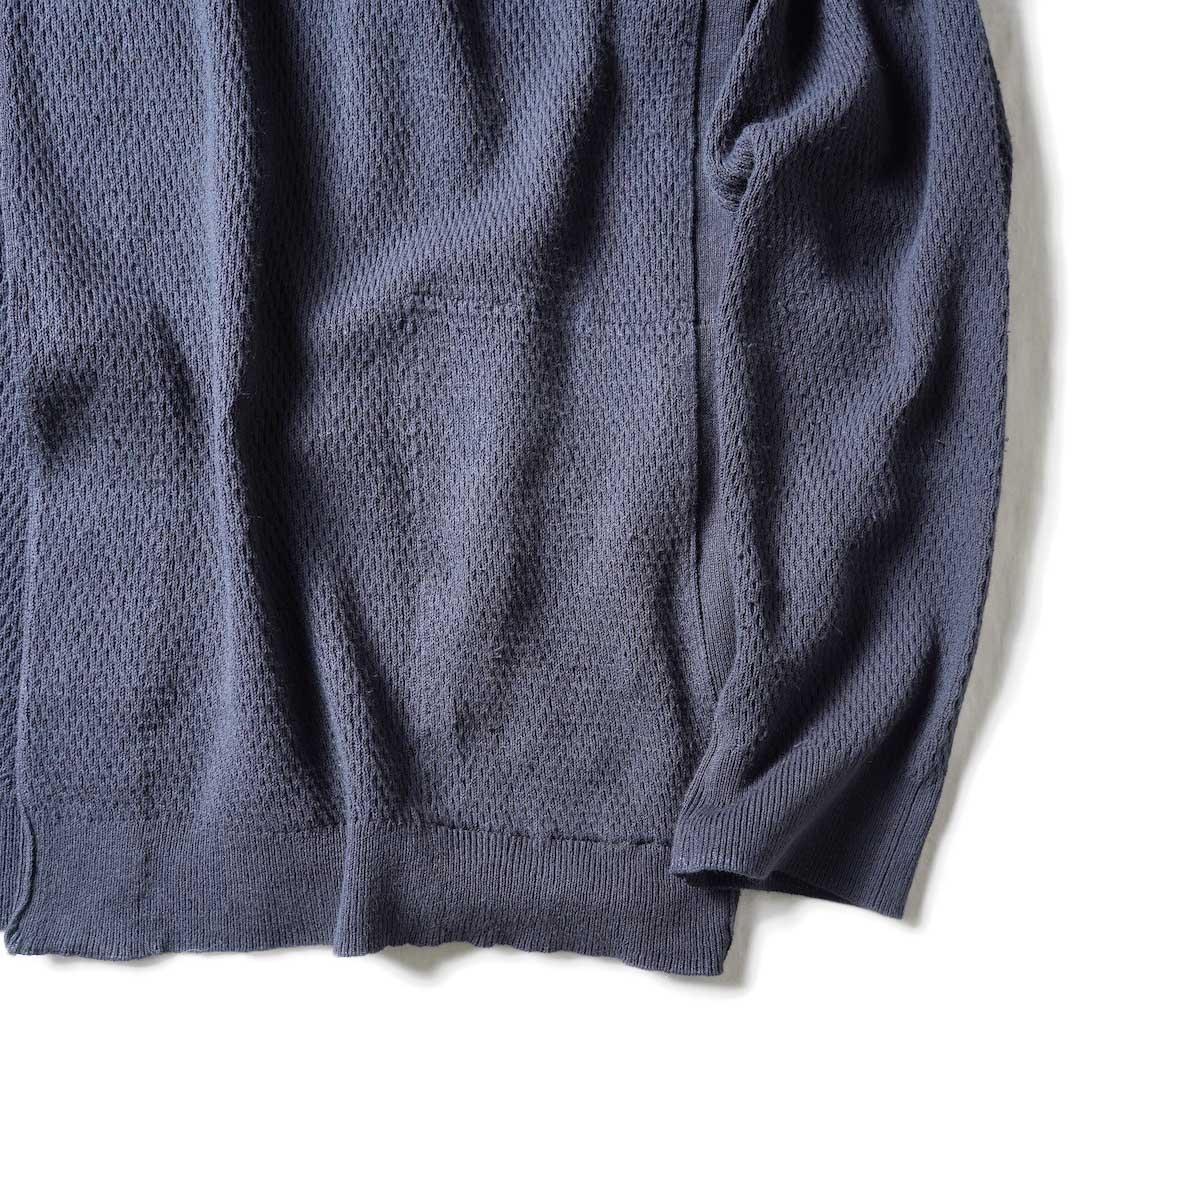 nonnative / TROOPER CARDIGAN COTTON YARN VW (Charcoal)裾、袖